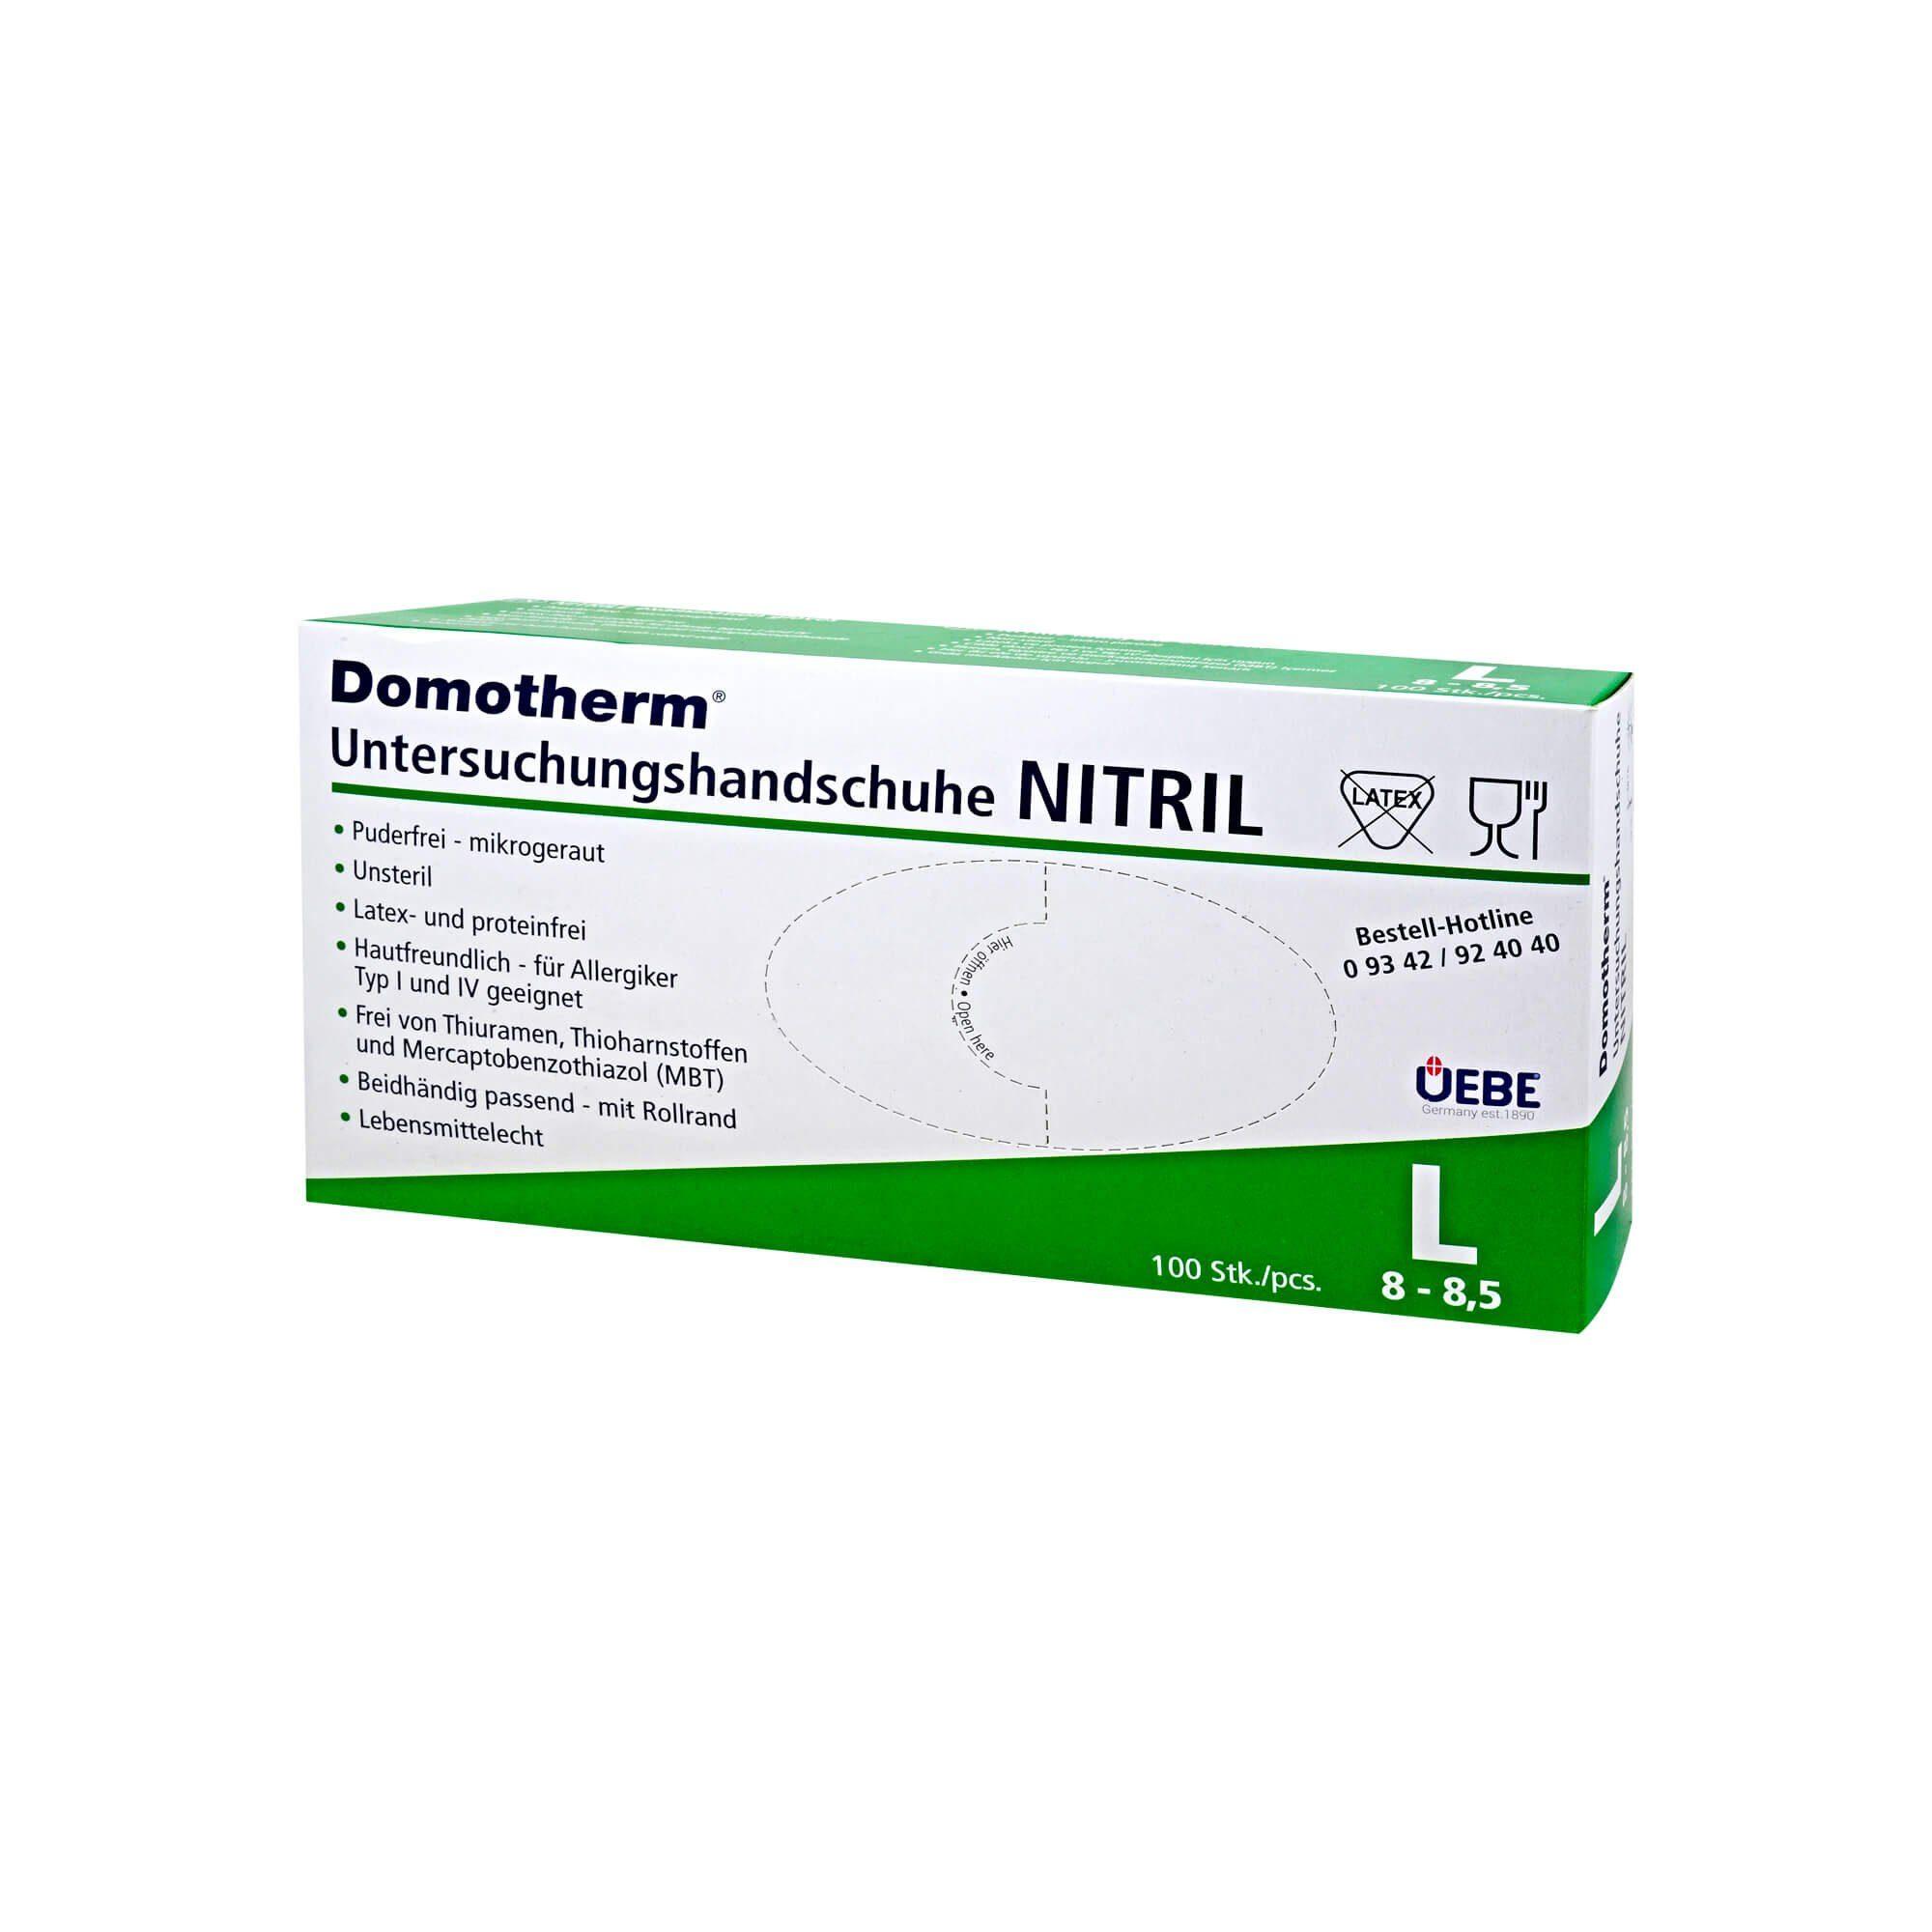 Domotherm Untersuchungshandschuhe Nitril L, 100 St